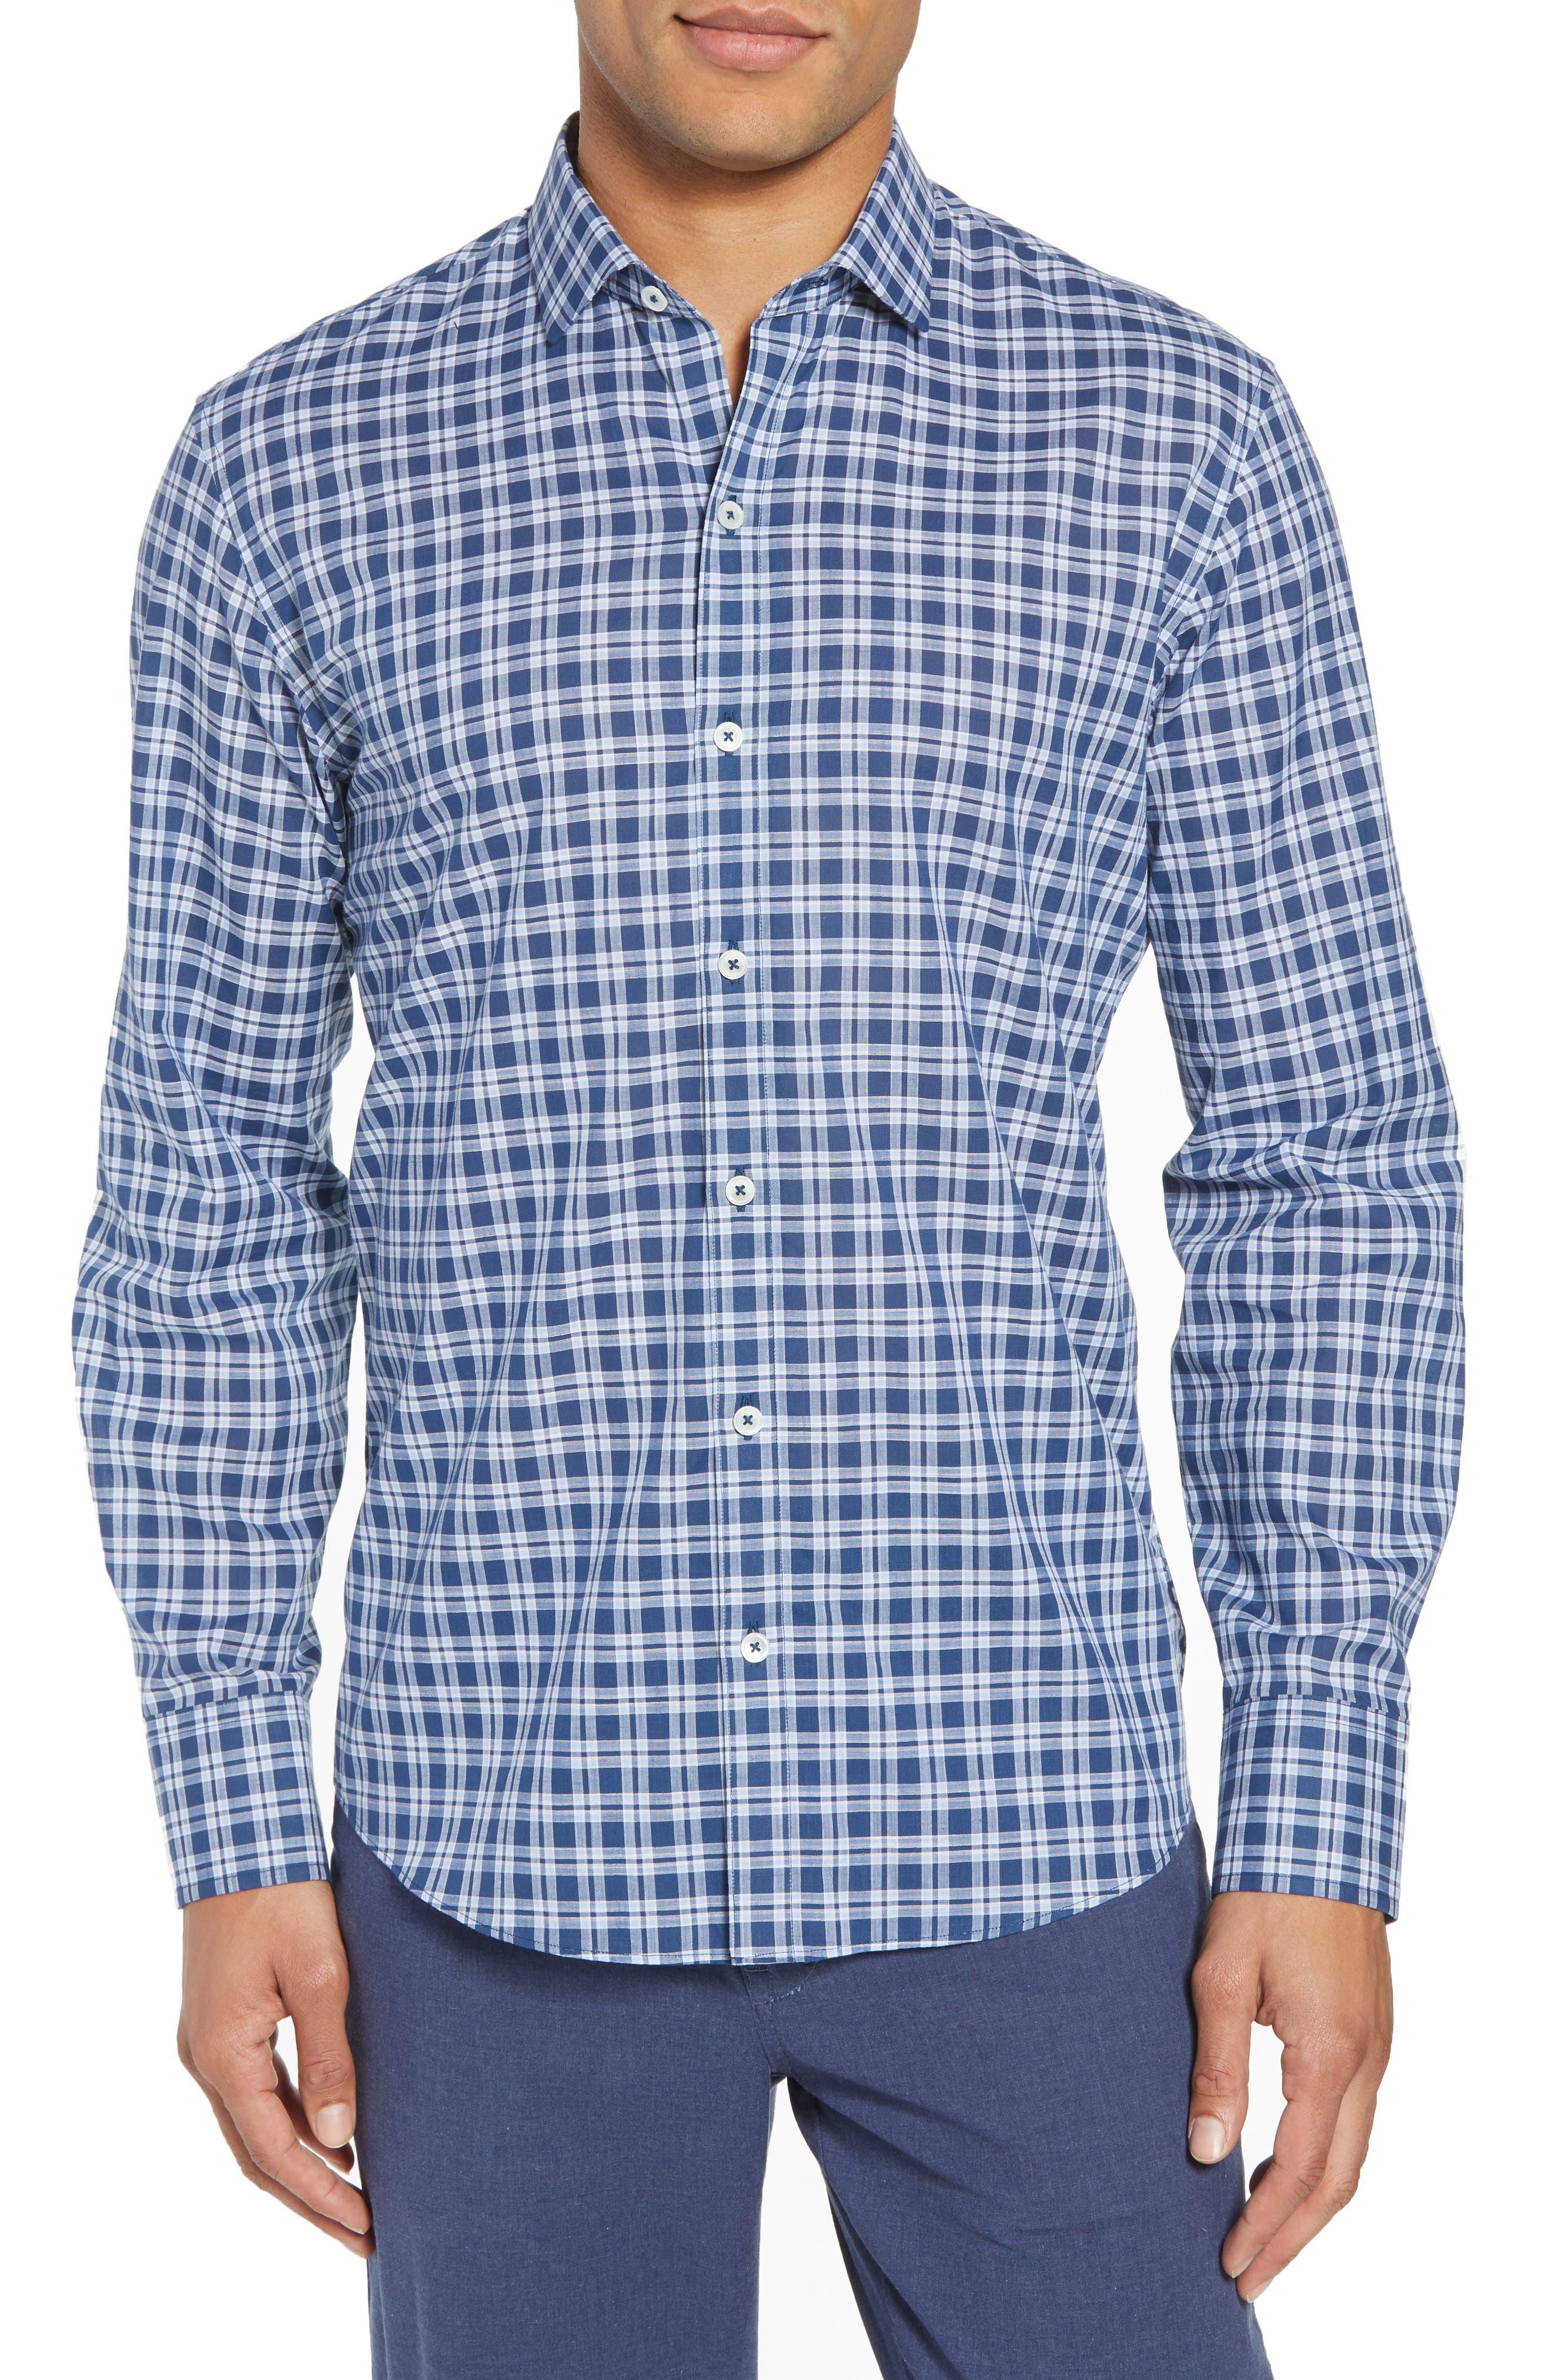 Speer Regular Fit Sport Shirt,                             Main thumbnail 1, color,                             Indigo